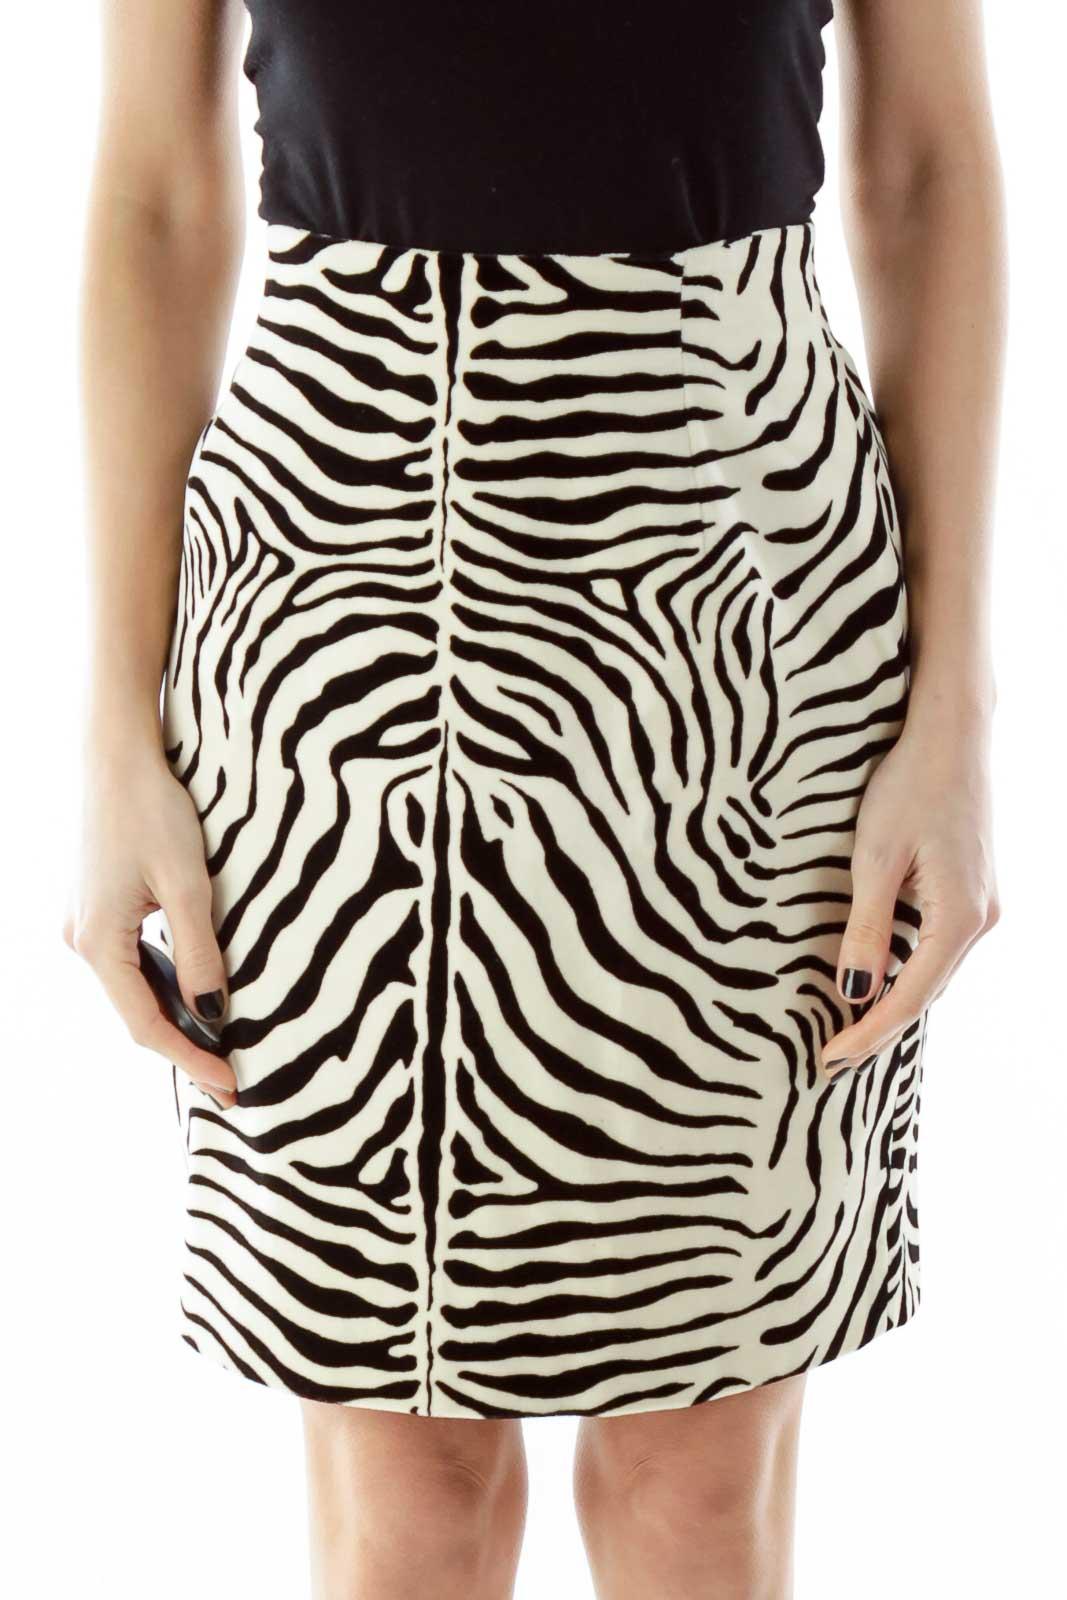 Black White Zebra Print A-Line Skirt Front